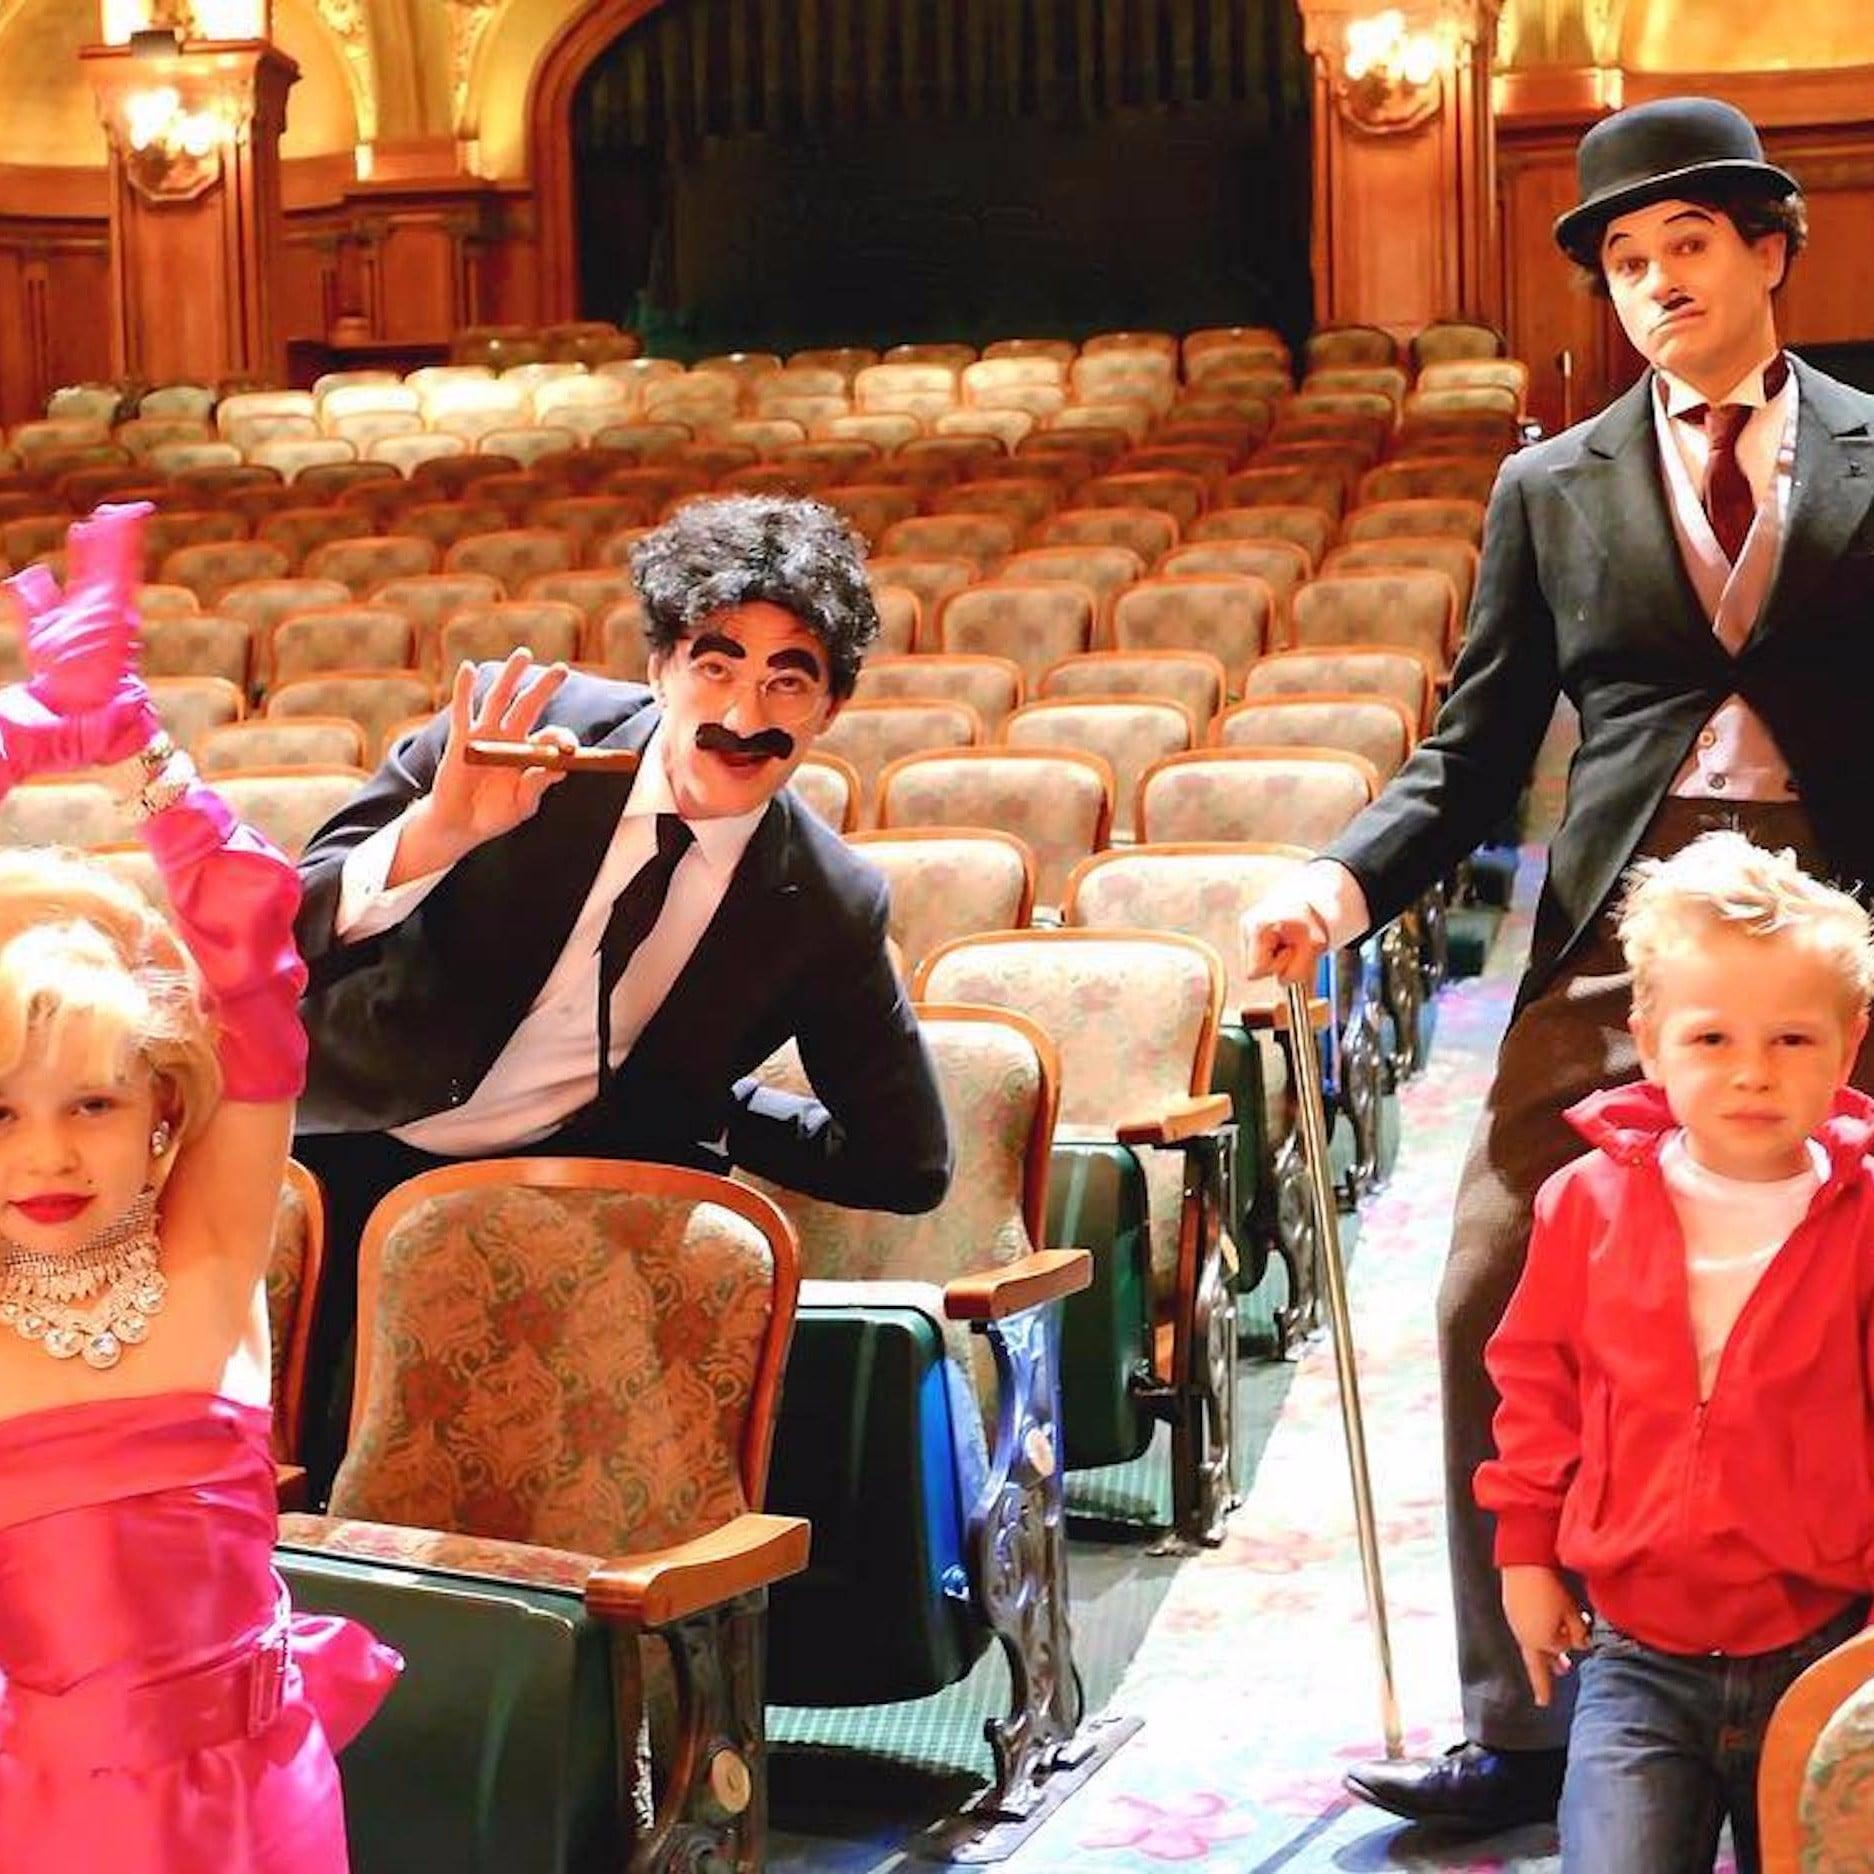 neil patrick harris family halloween costume 2016 | popsugar